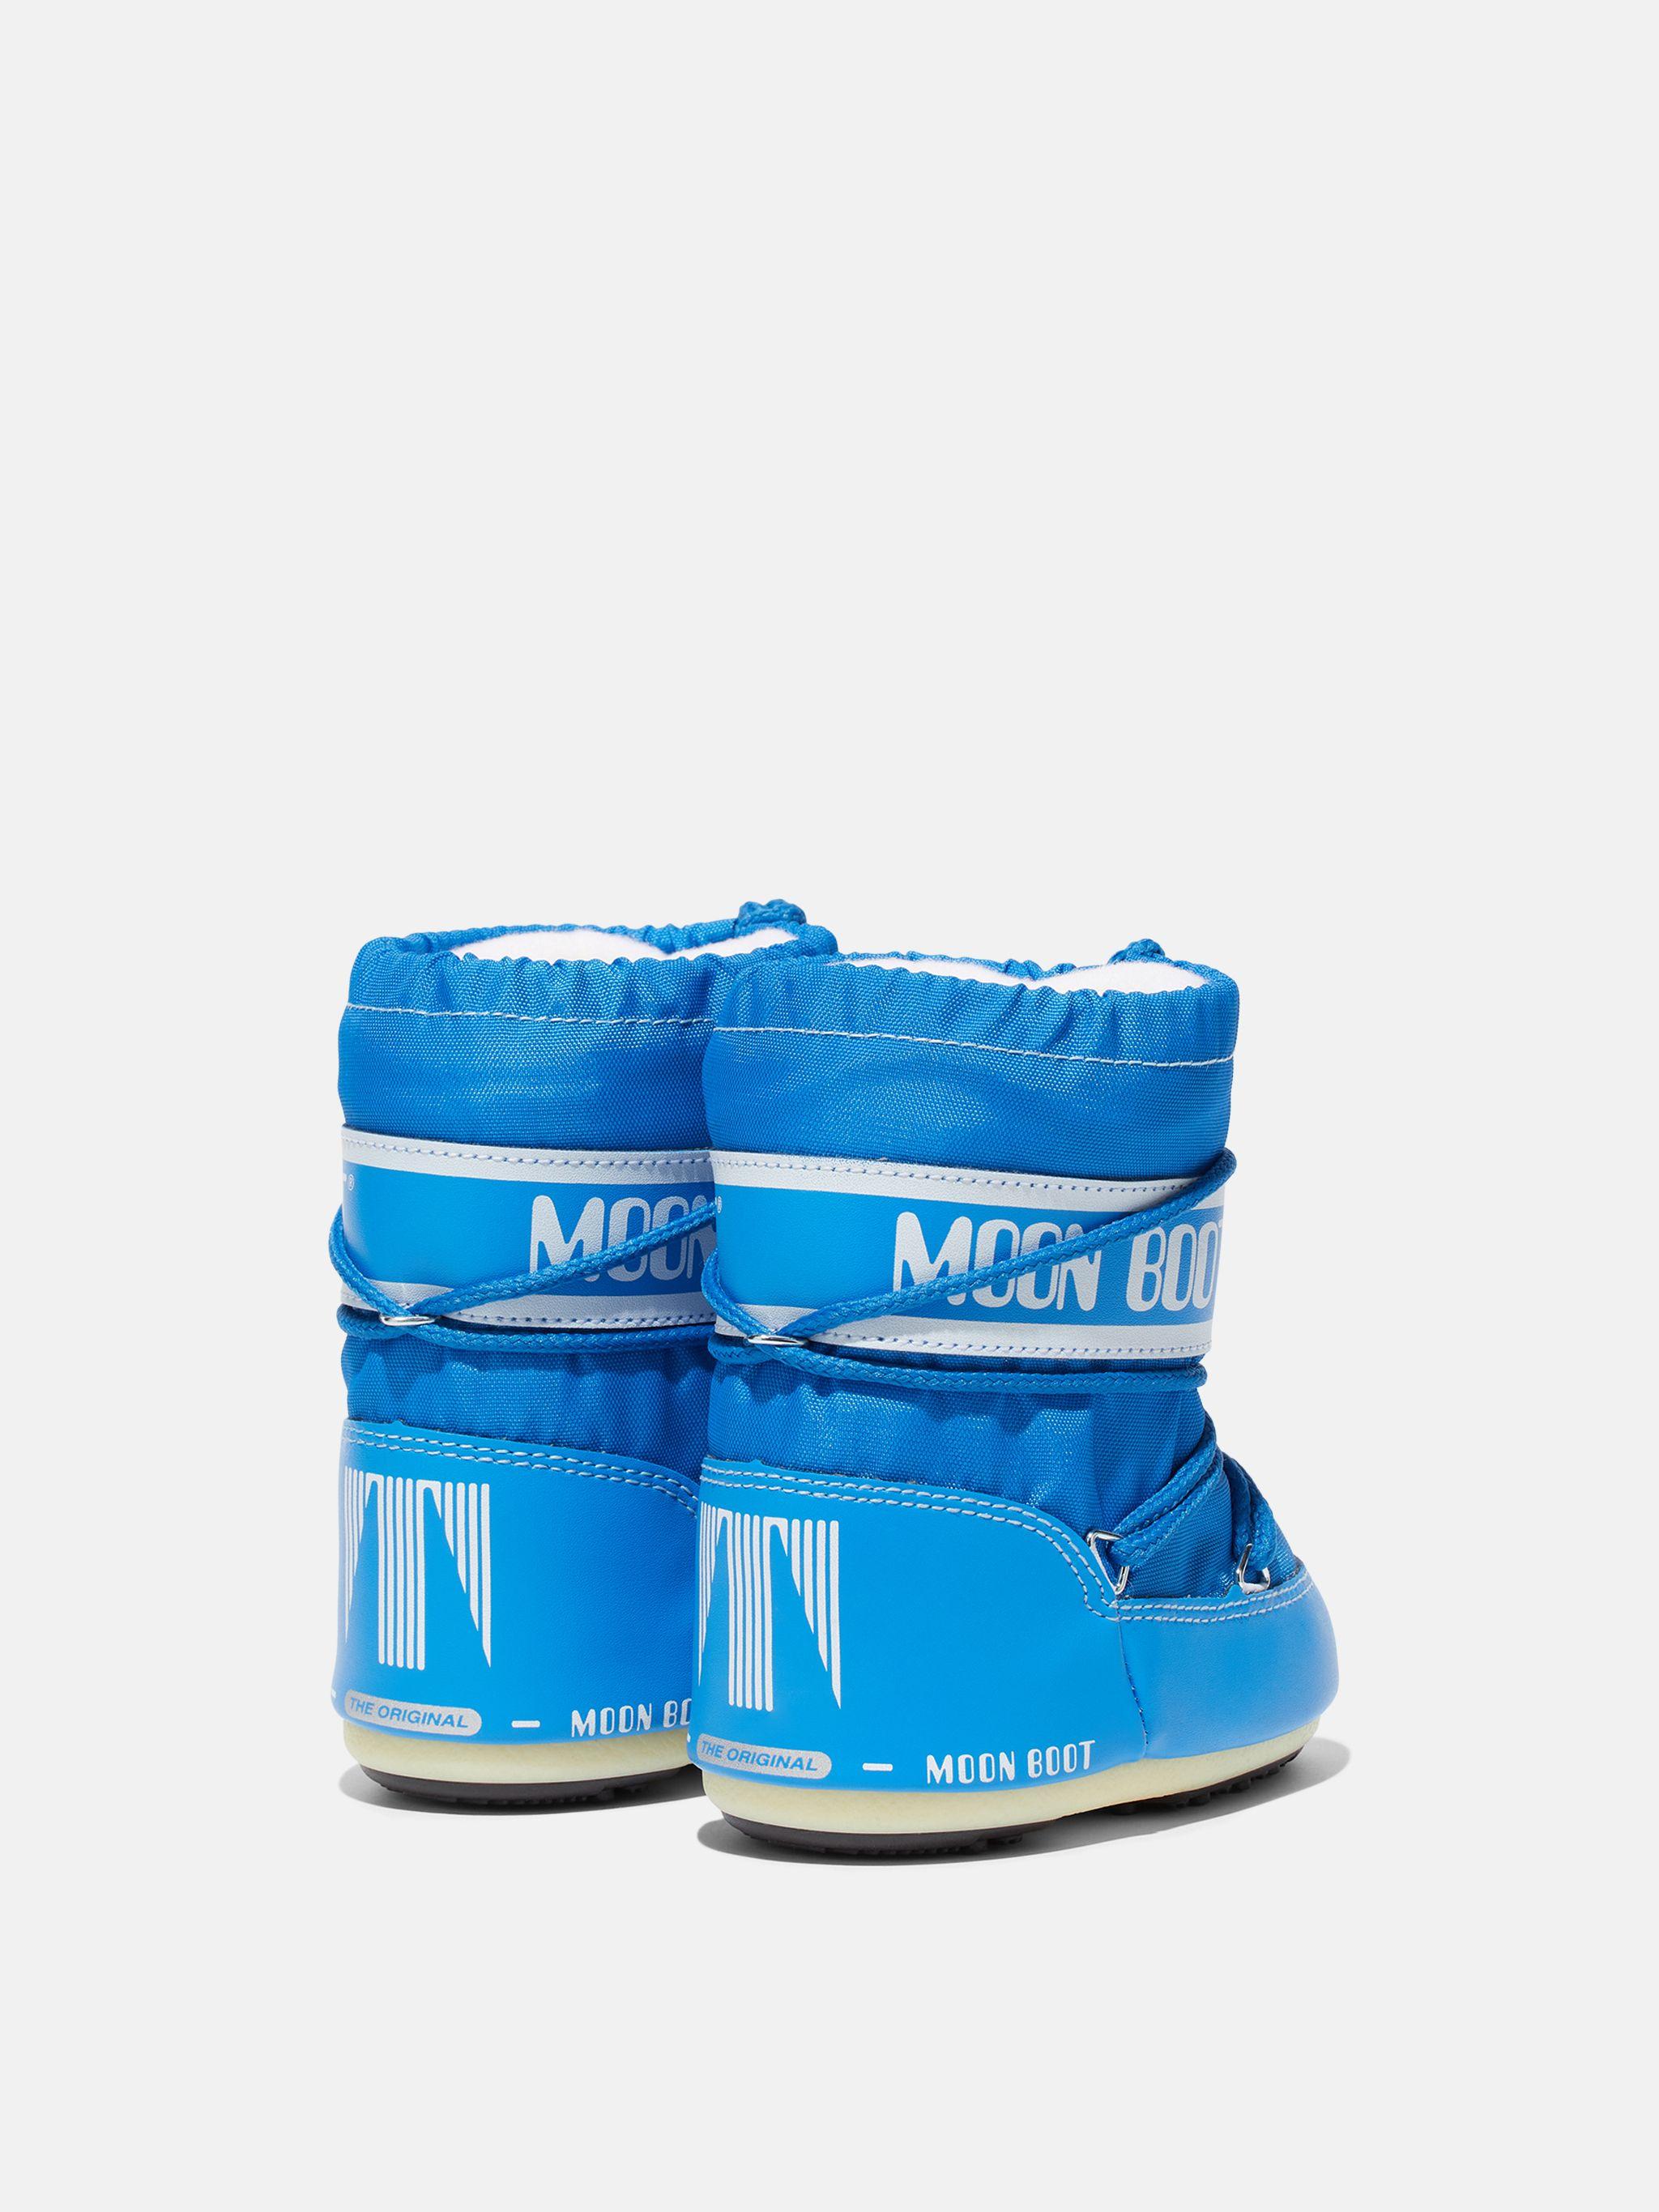 BOTAS ICON MINI AZURE-BLUE DE NAILON